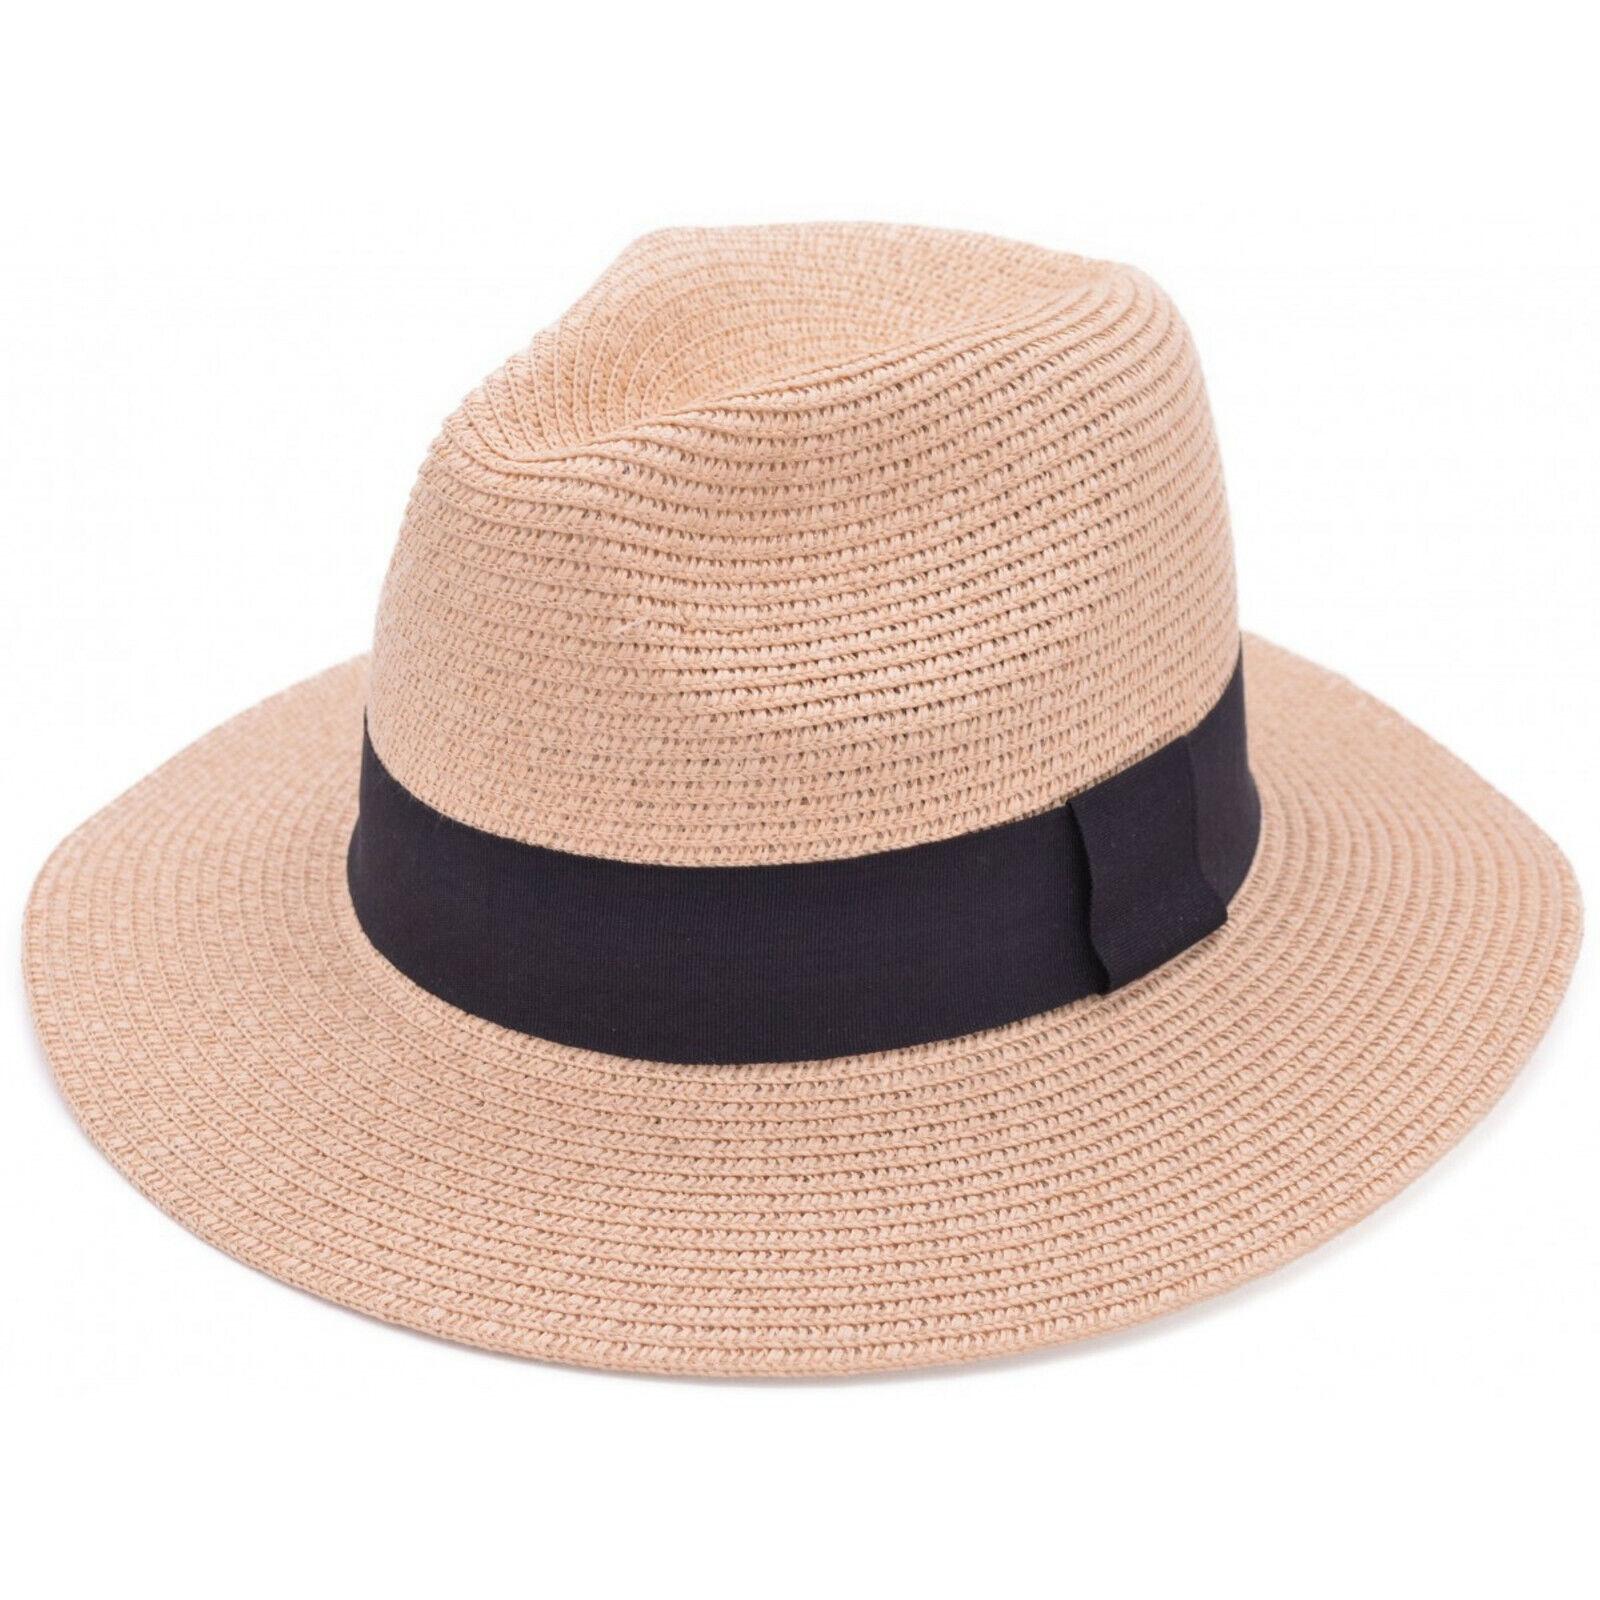 deb7aa65 Mens Ladies Unisex Beige Summer Panama Hat Sun Beach Straw Fedora Trilby